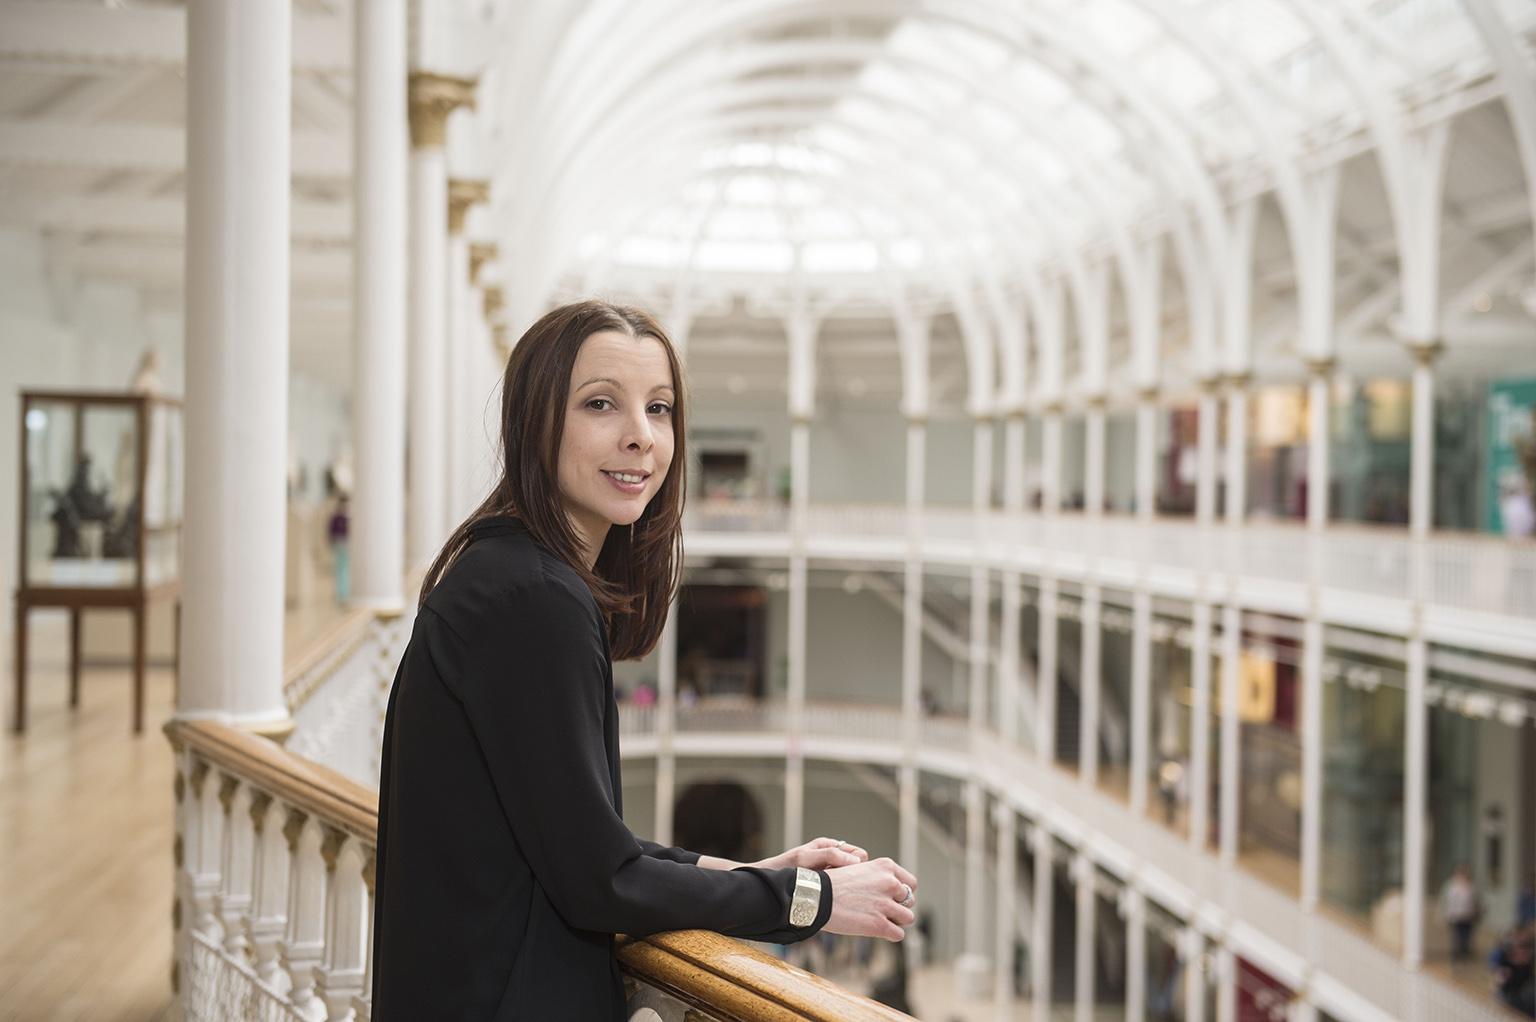 Sarah Rothwell, National Museums Scotland